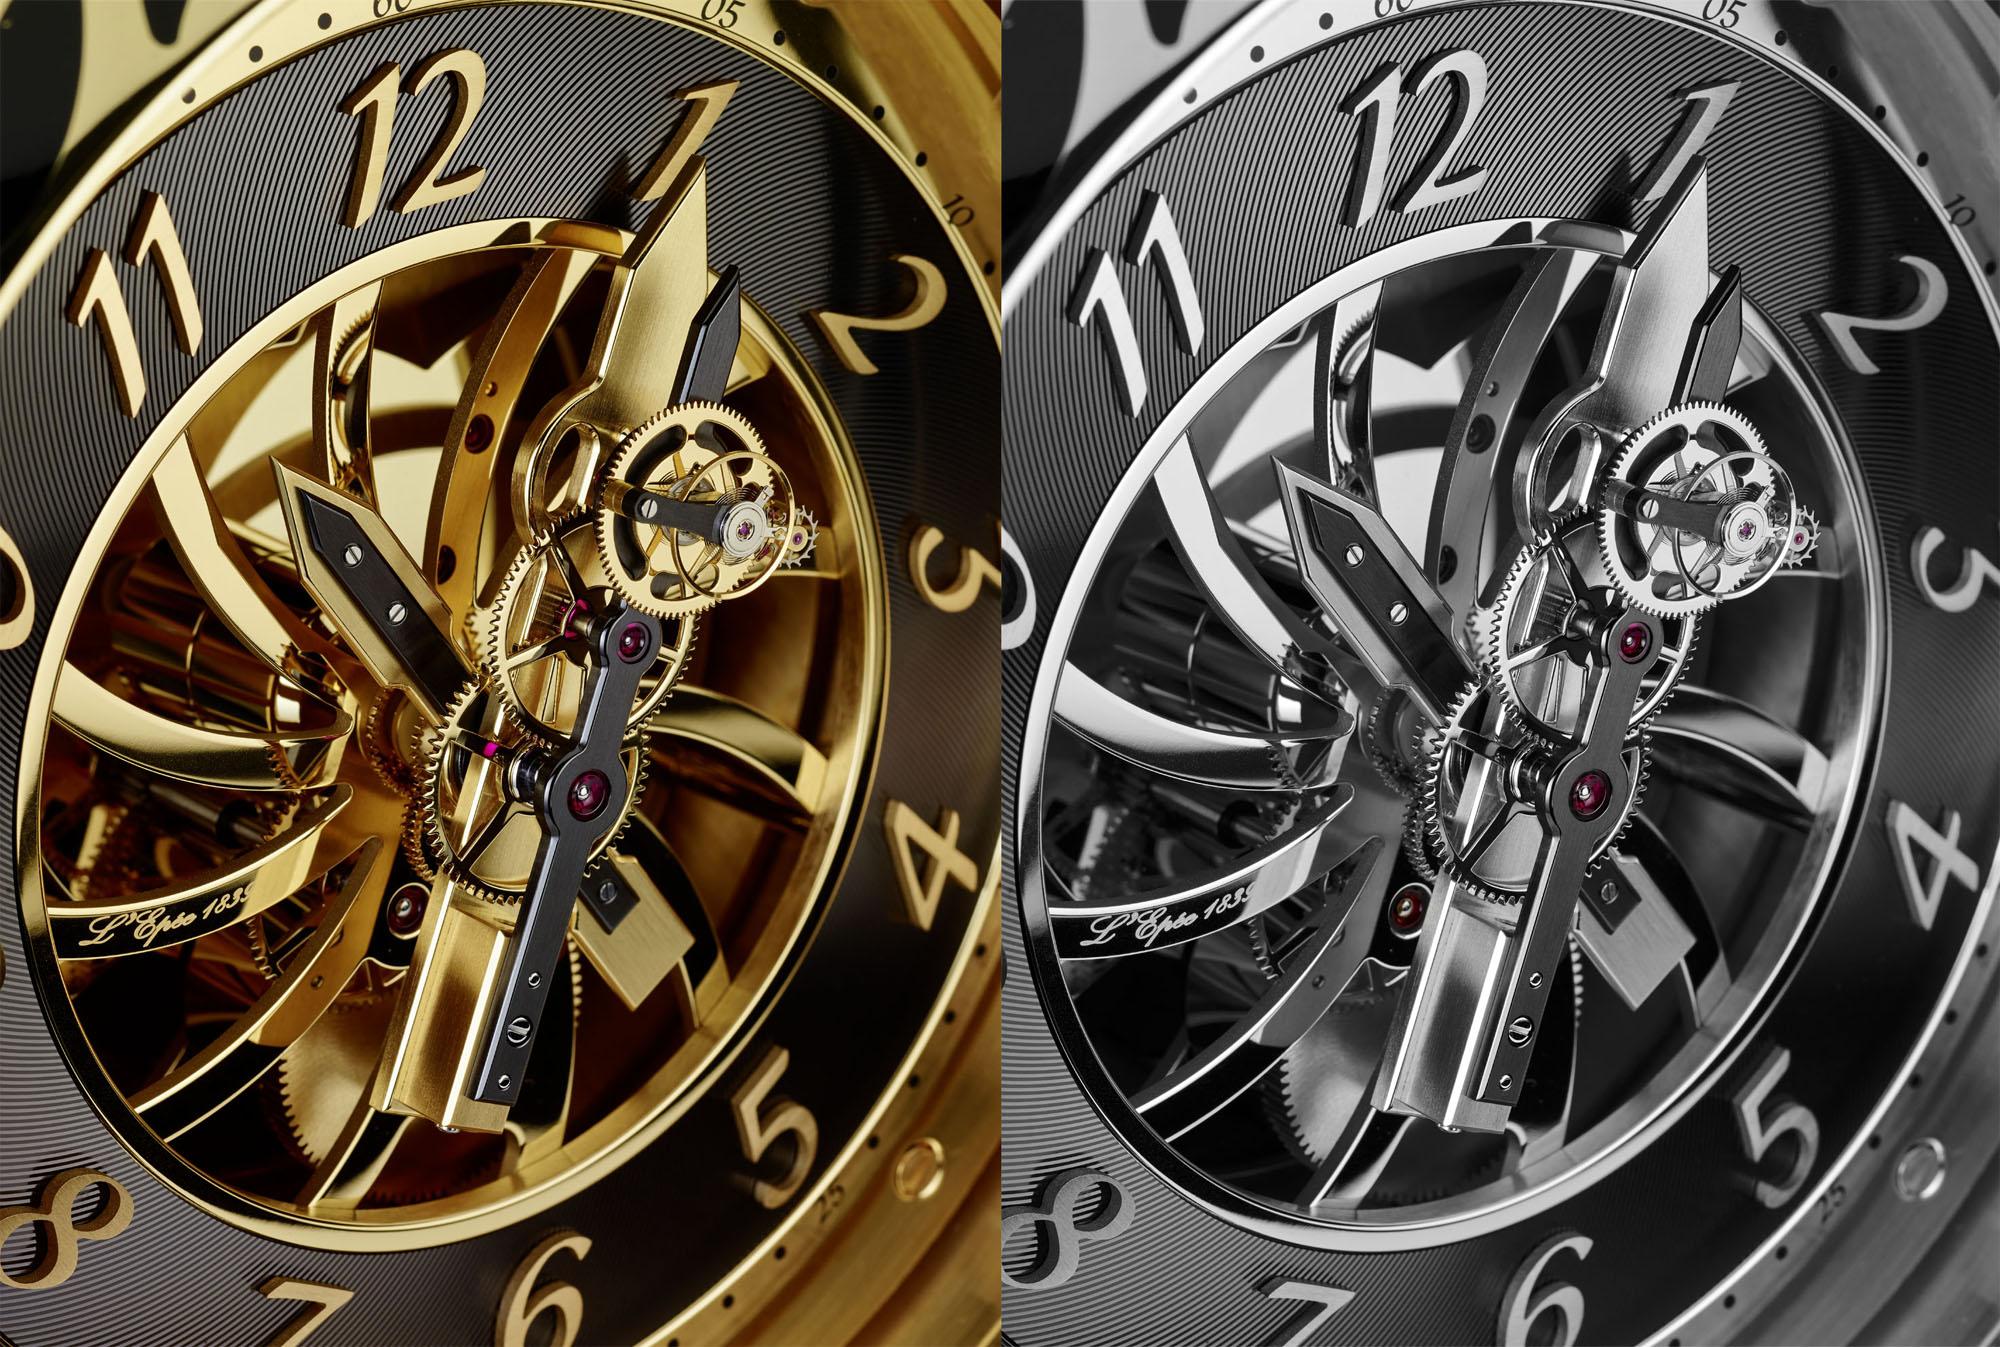 L'Épée Two Hands Flying Tourbillon Clock with Vincent Calabrese